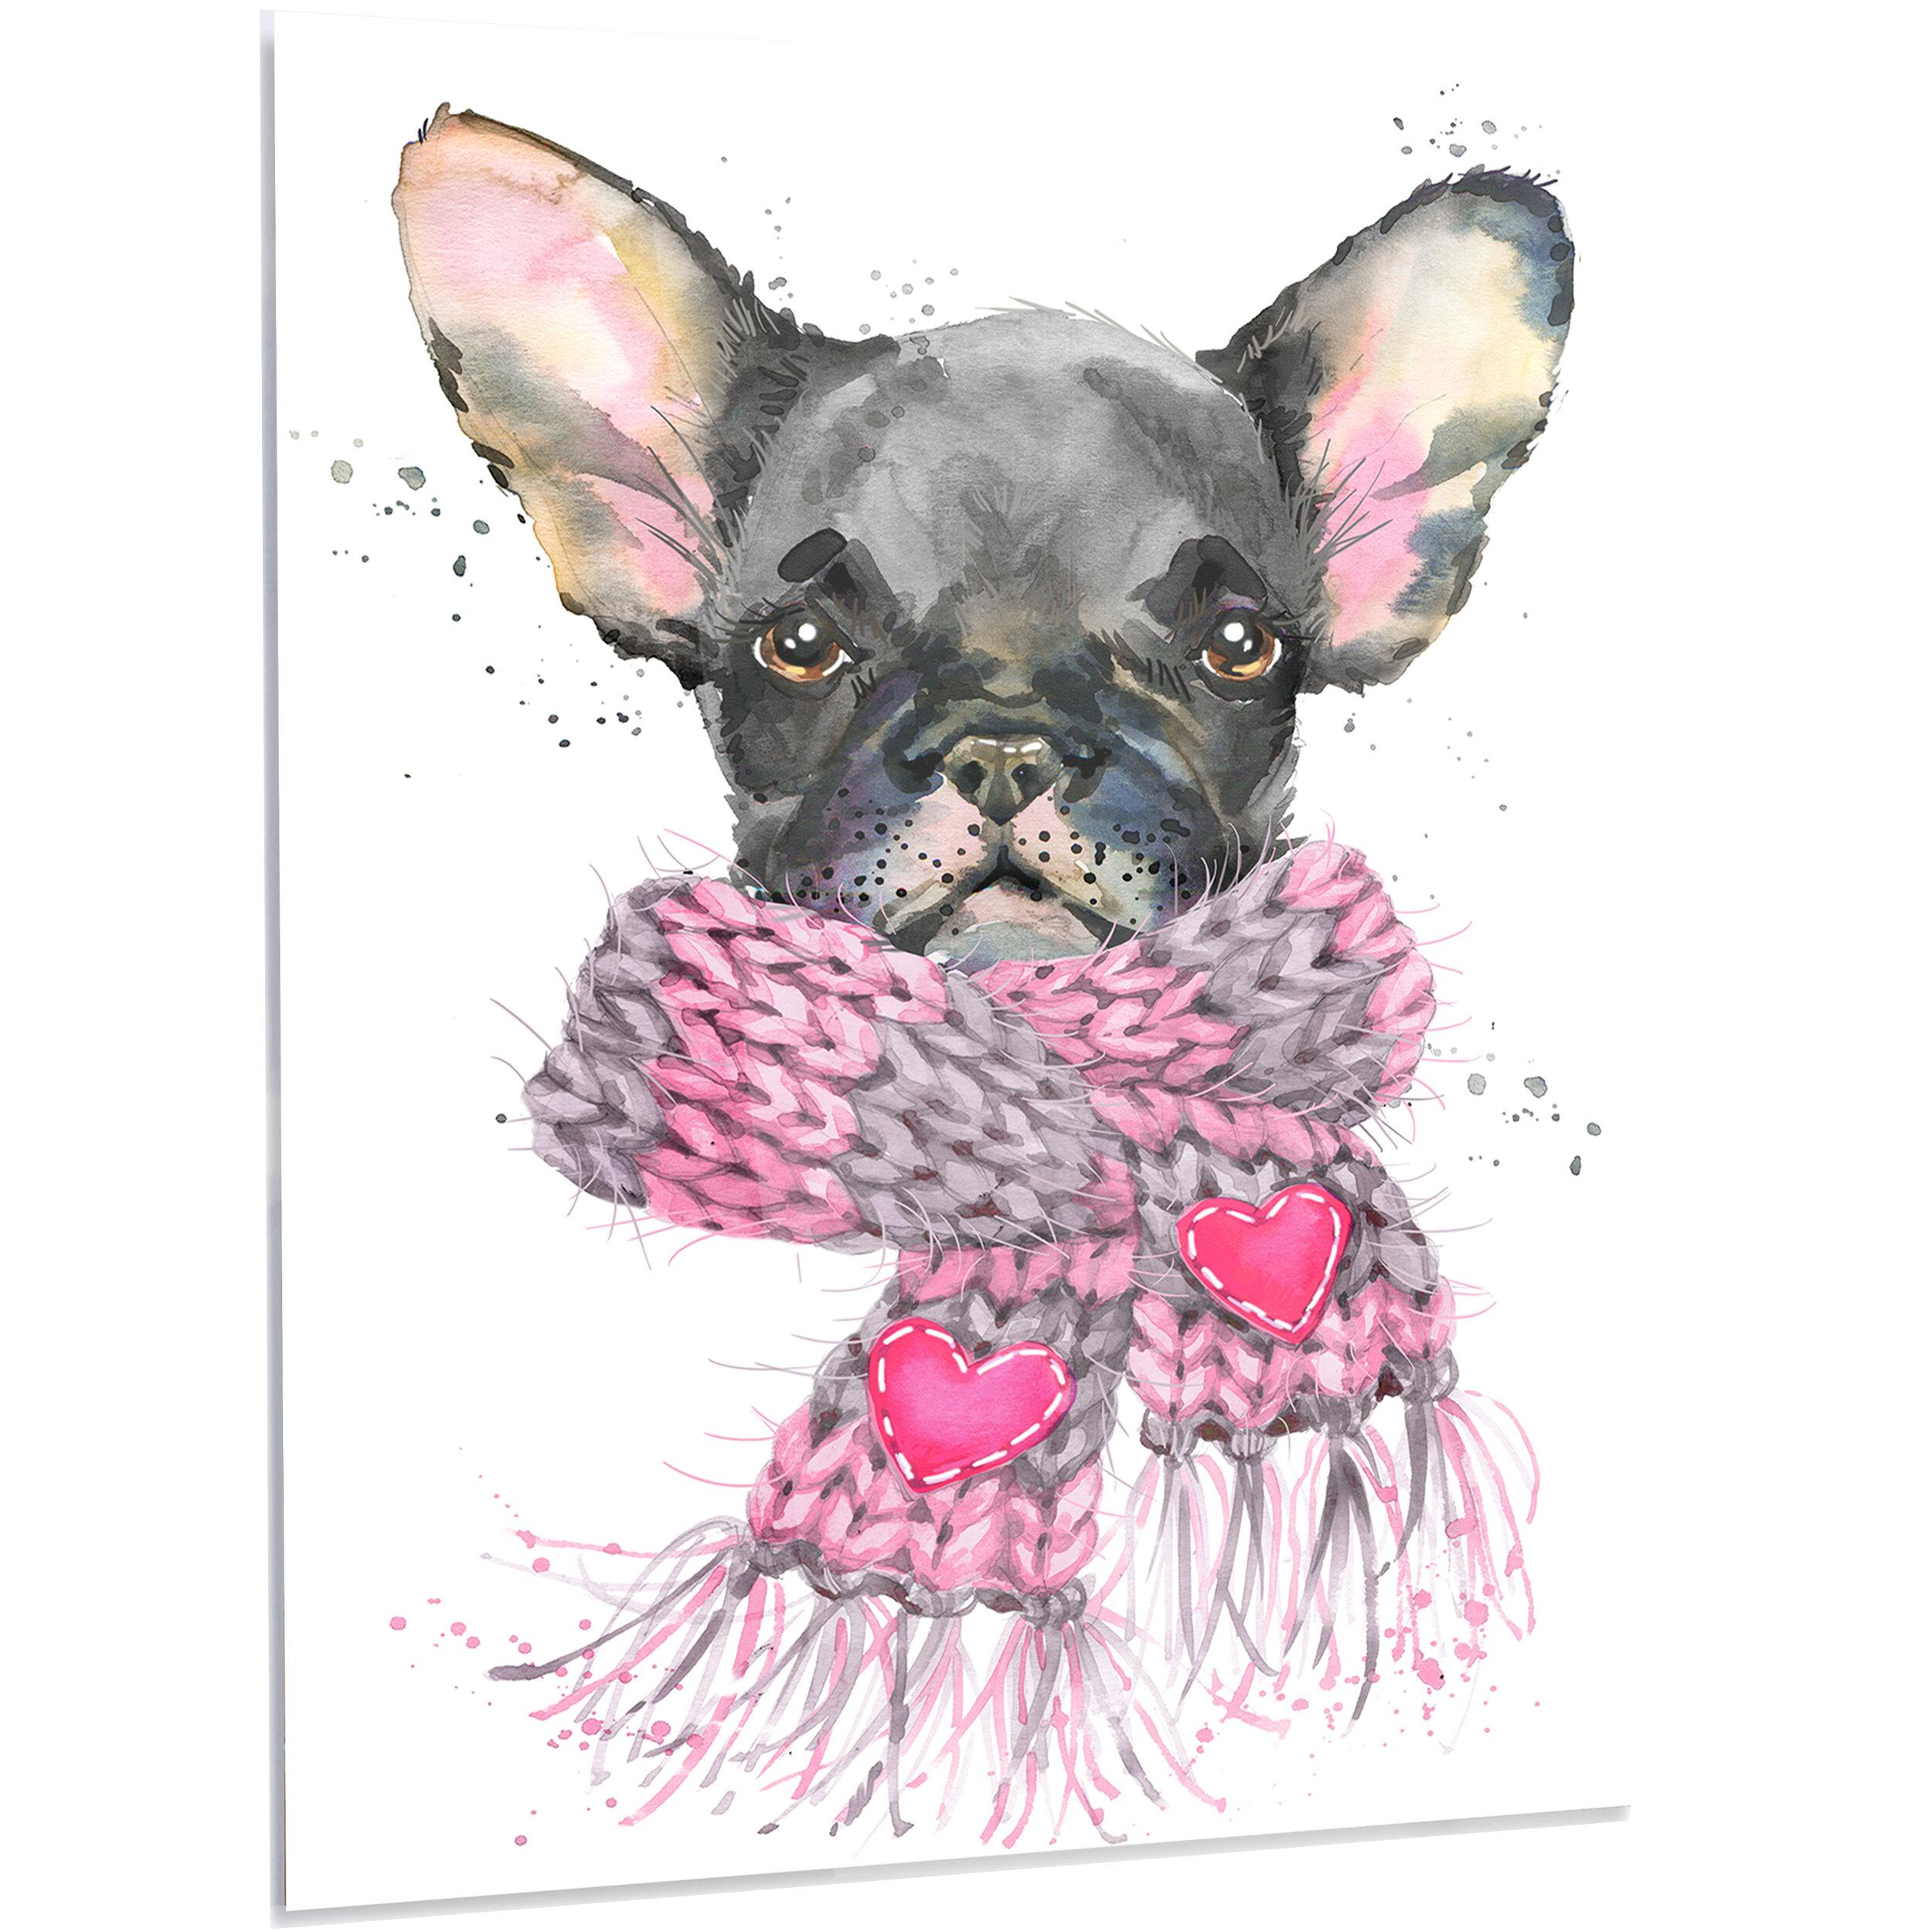 Designart Cute Puppy Dog With Pink Shawl Painting Print On Metal Wayfair